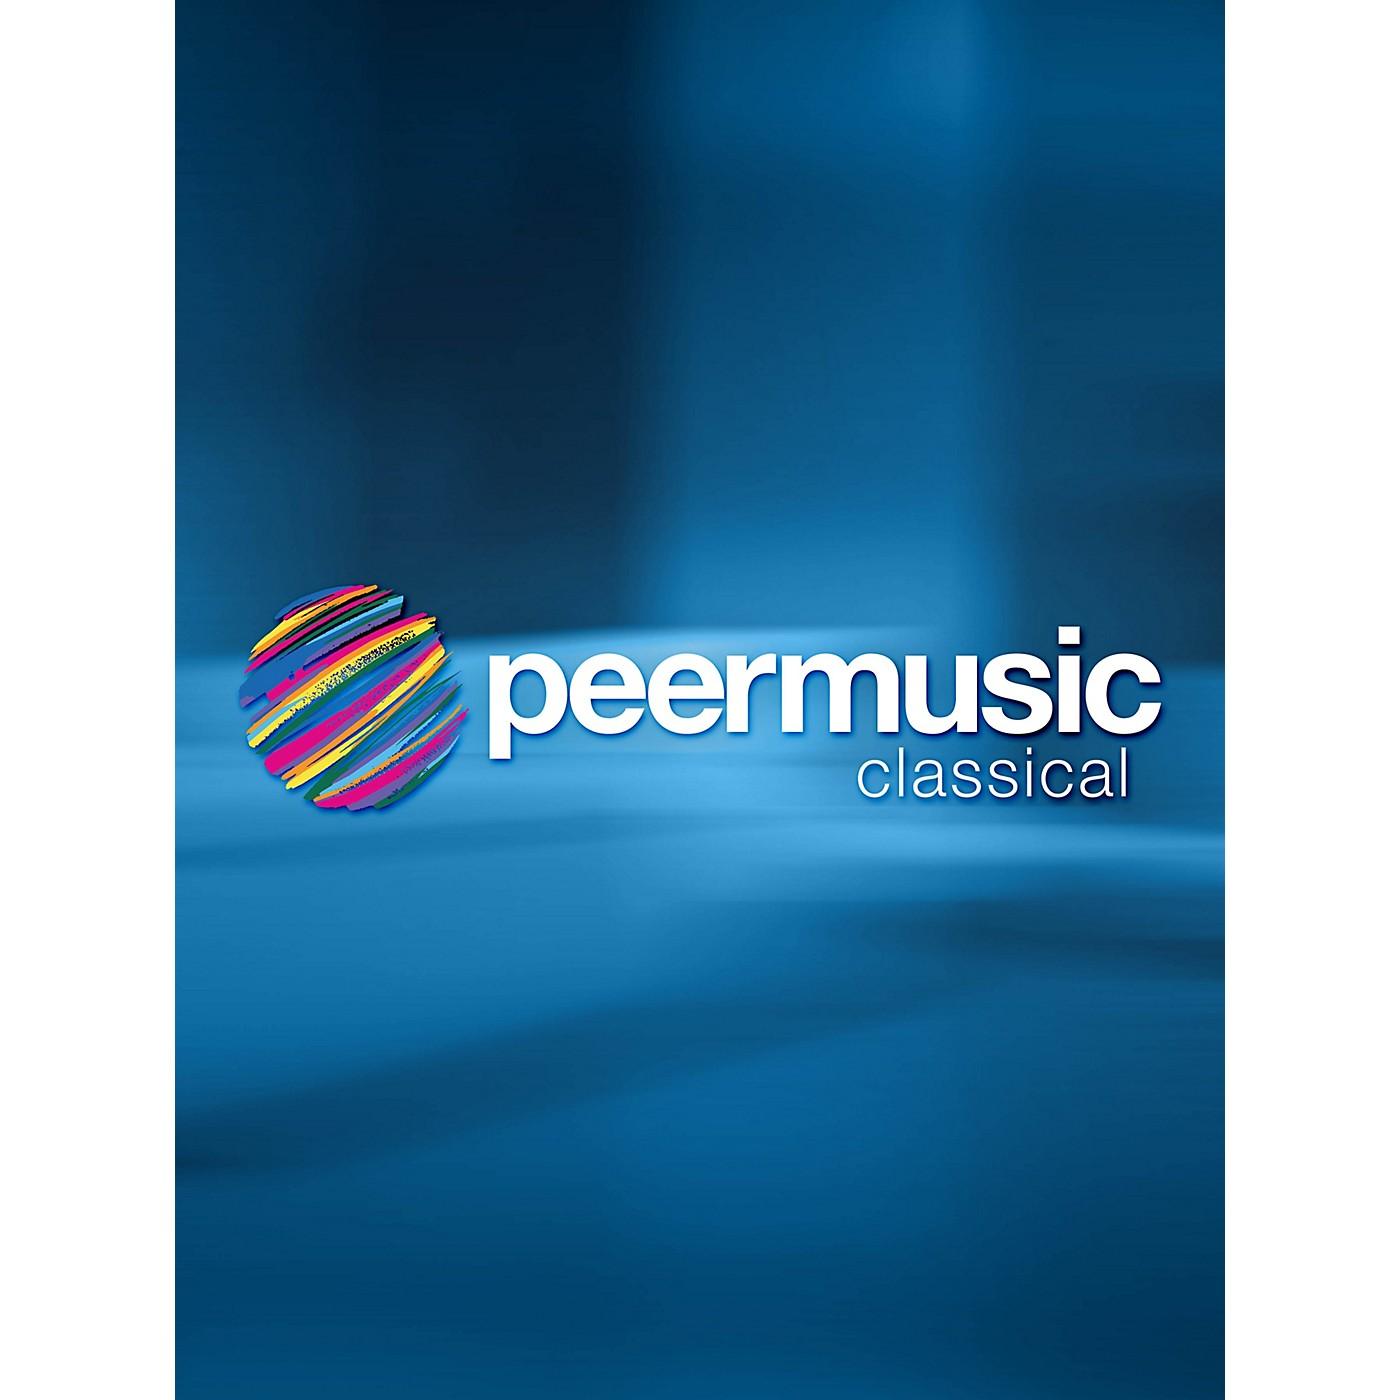 Peer Music Silhouette Peermusic Classical Series thumbnail